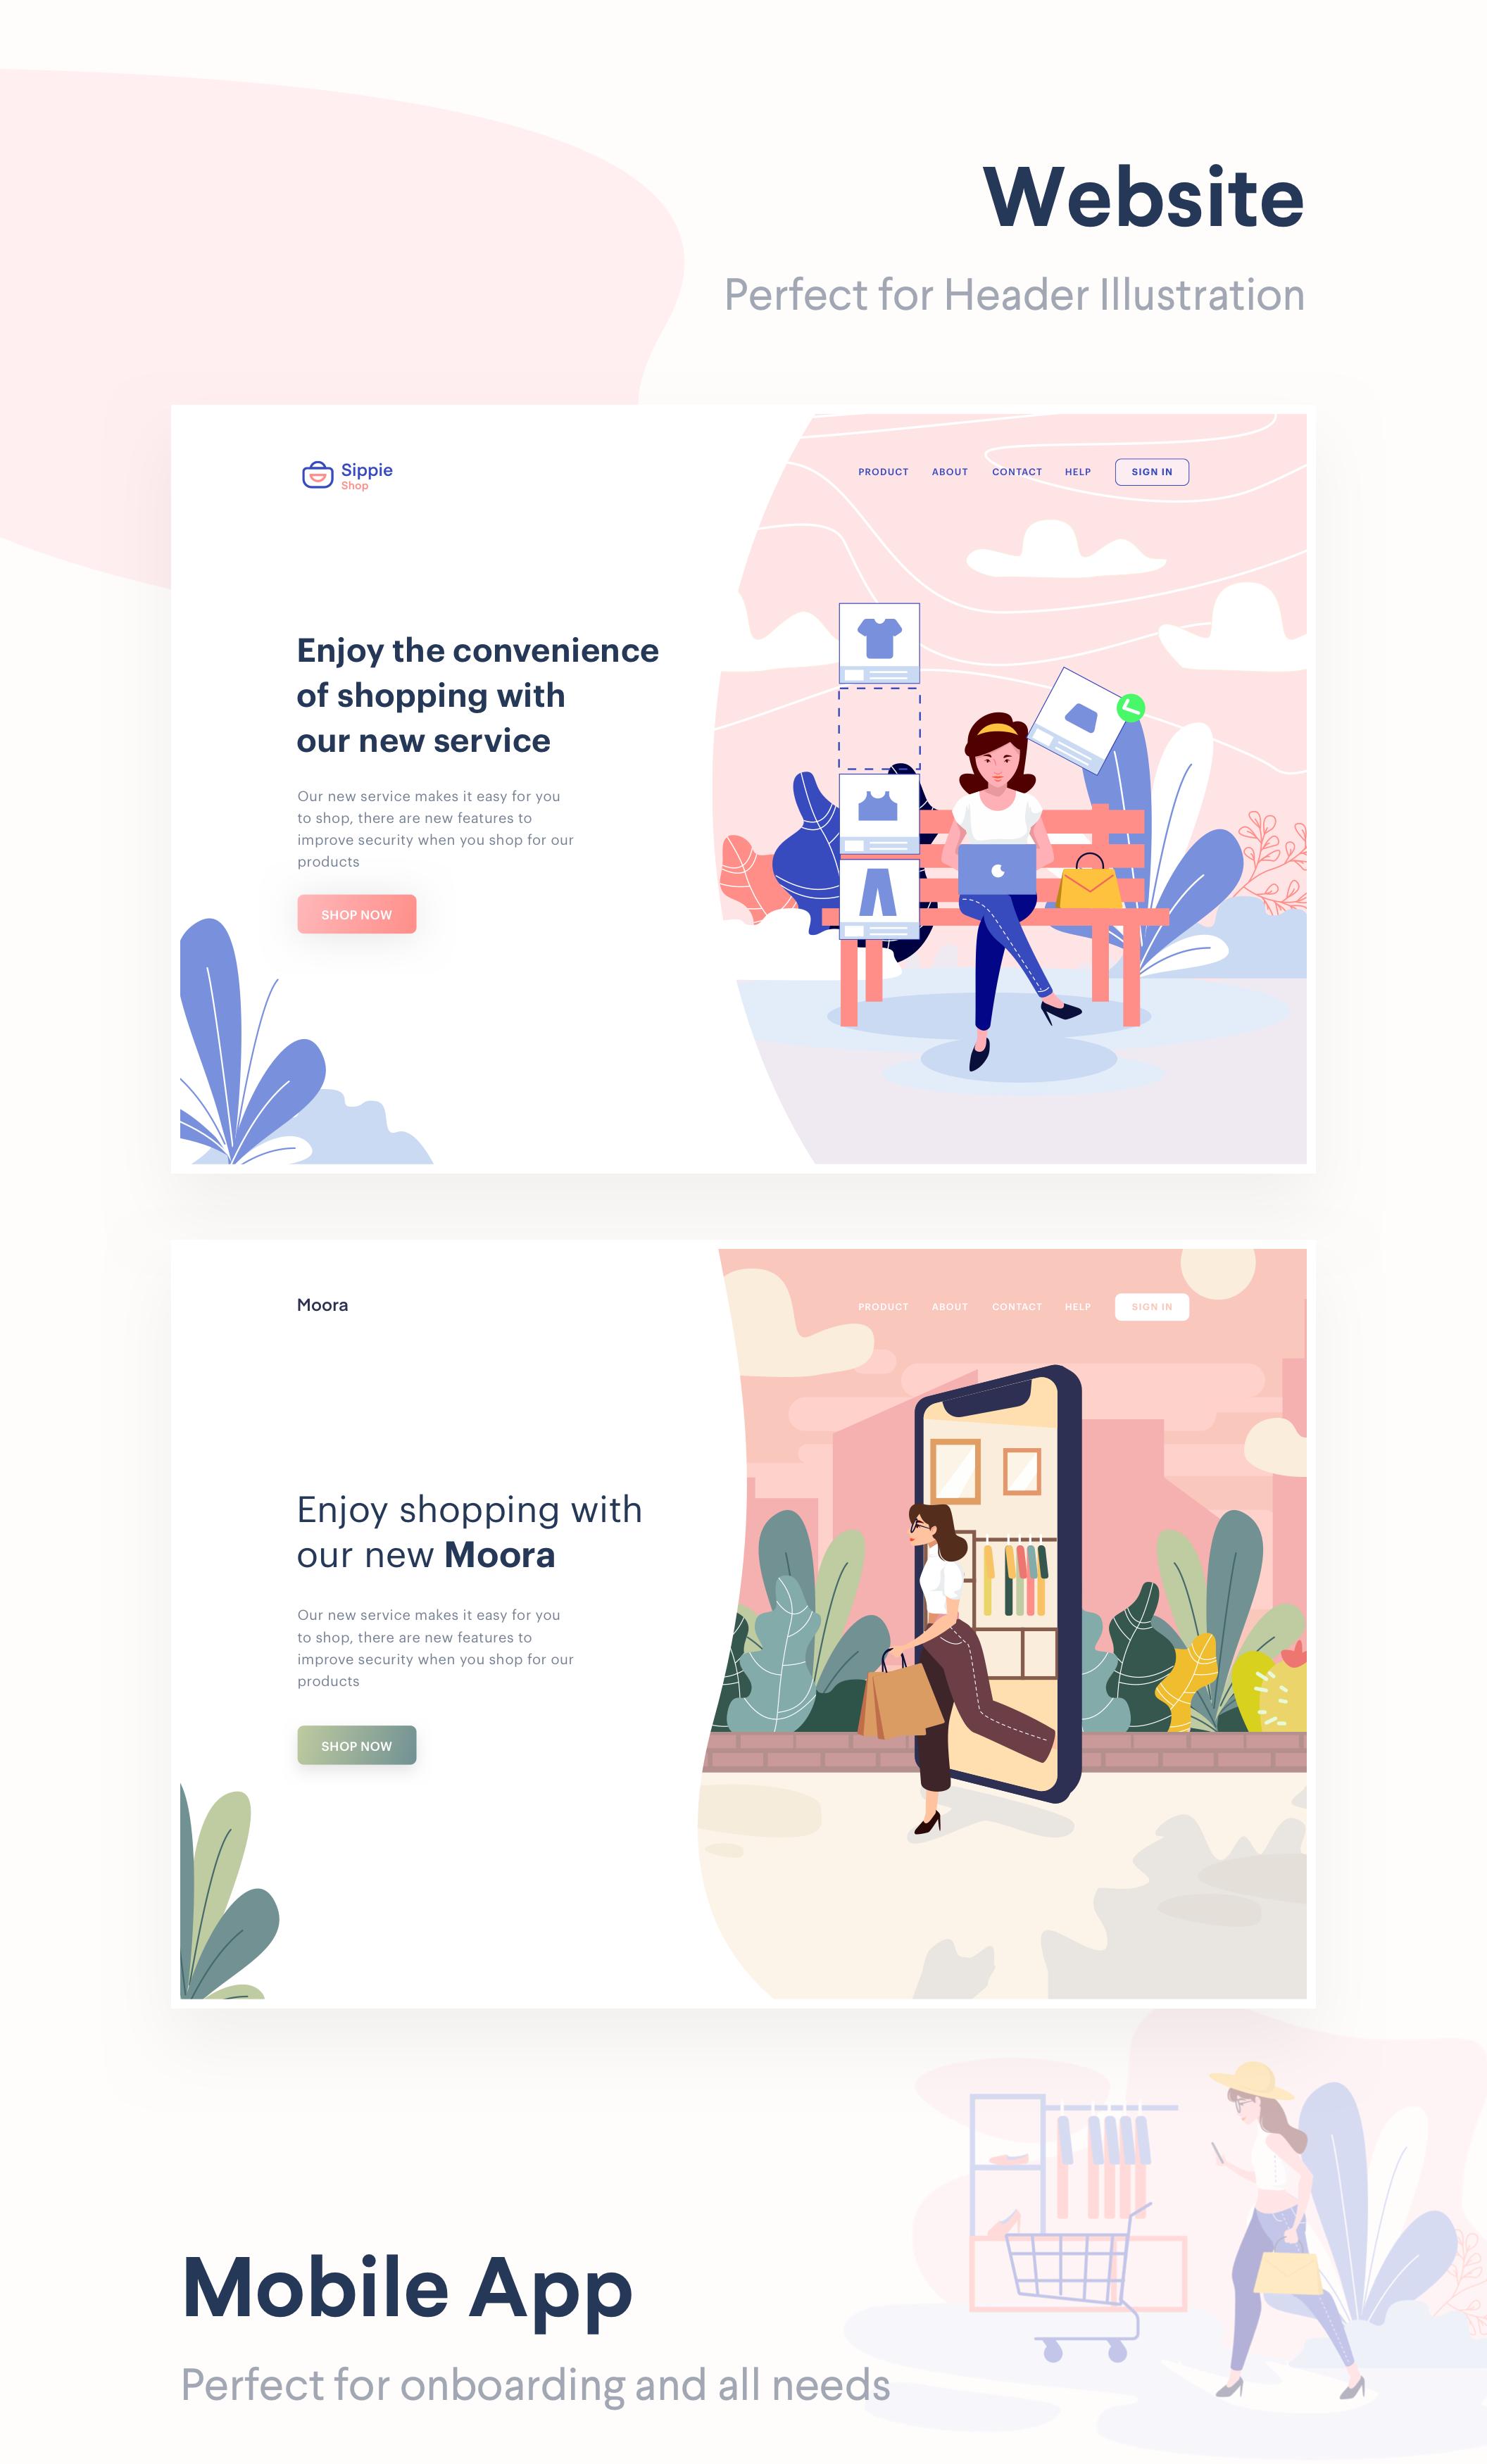 时尚购物商城2.5D矢量概念插画 Lunas : E-commerce Illustration Kit插图(7)